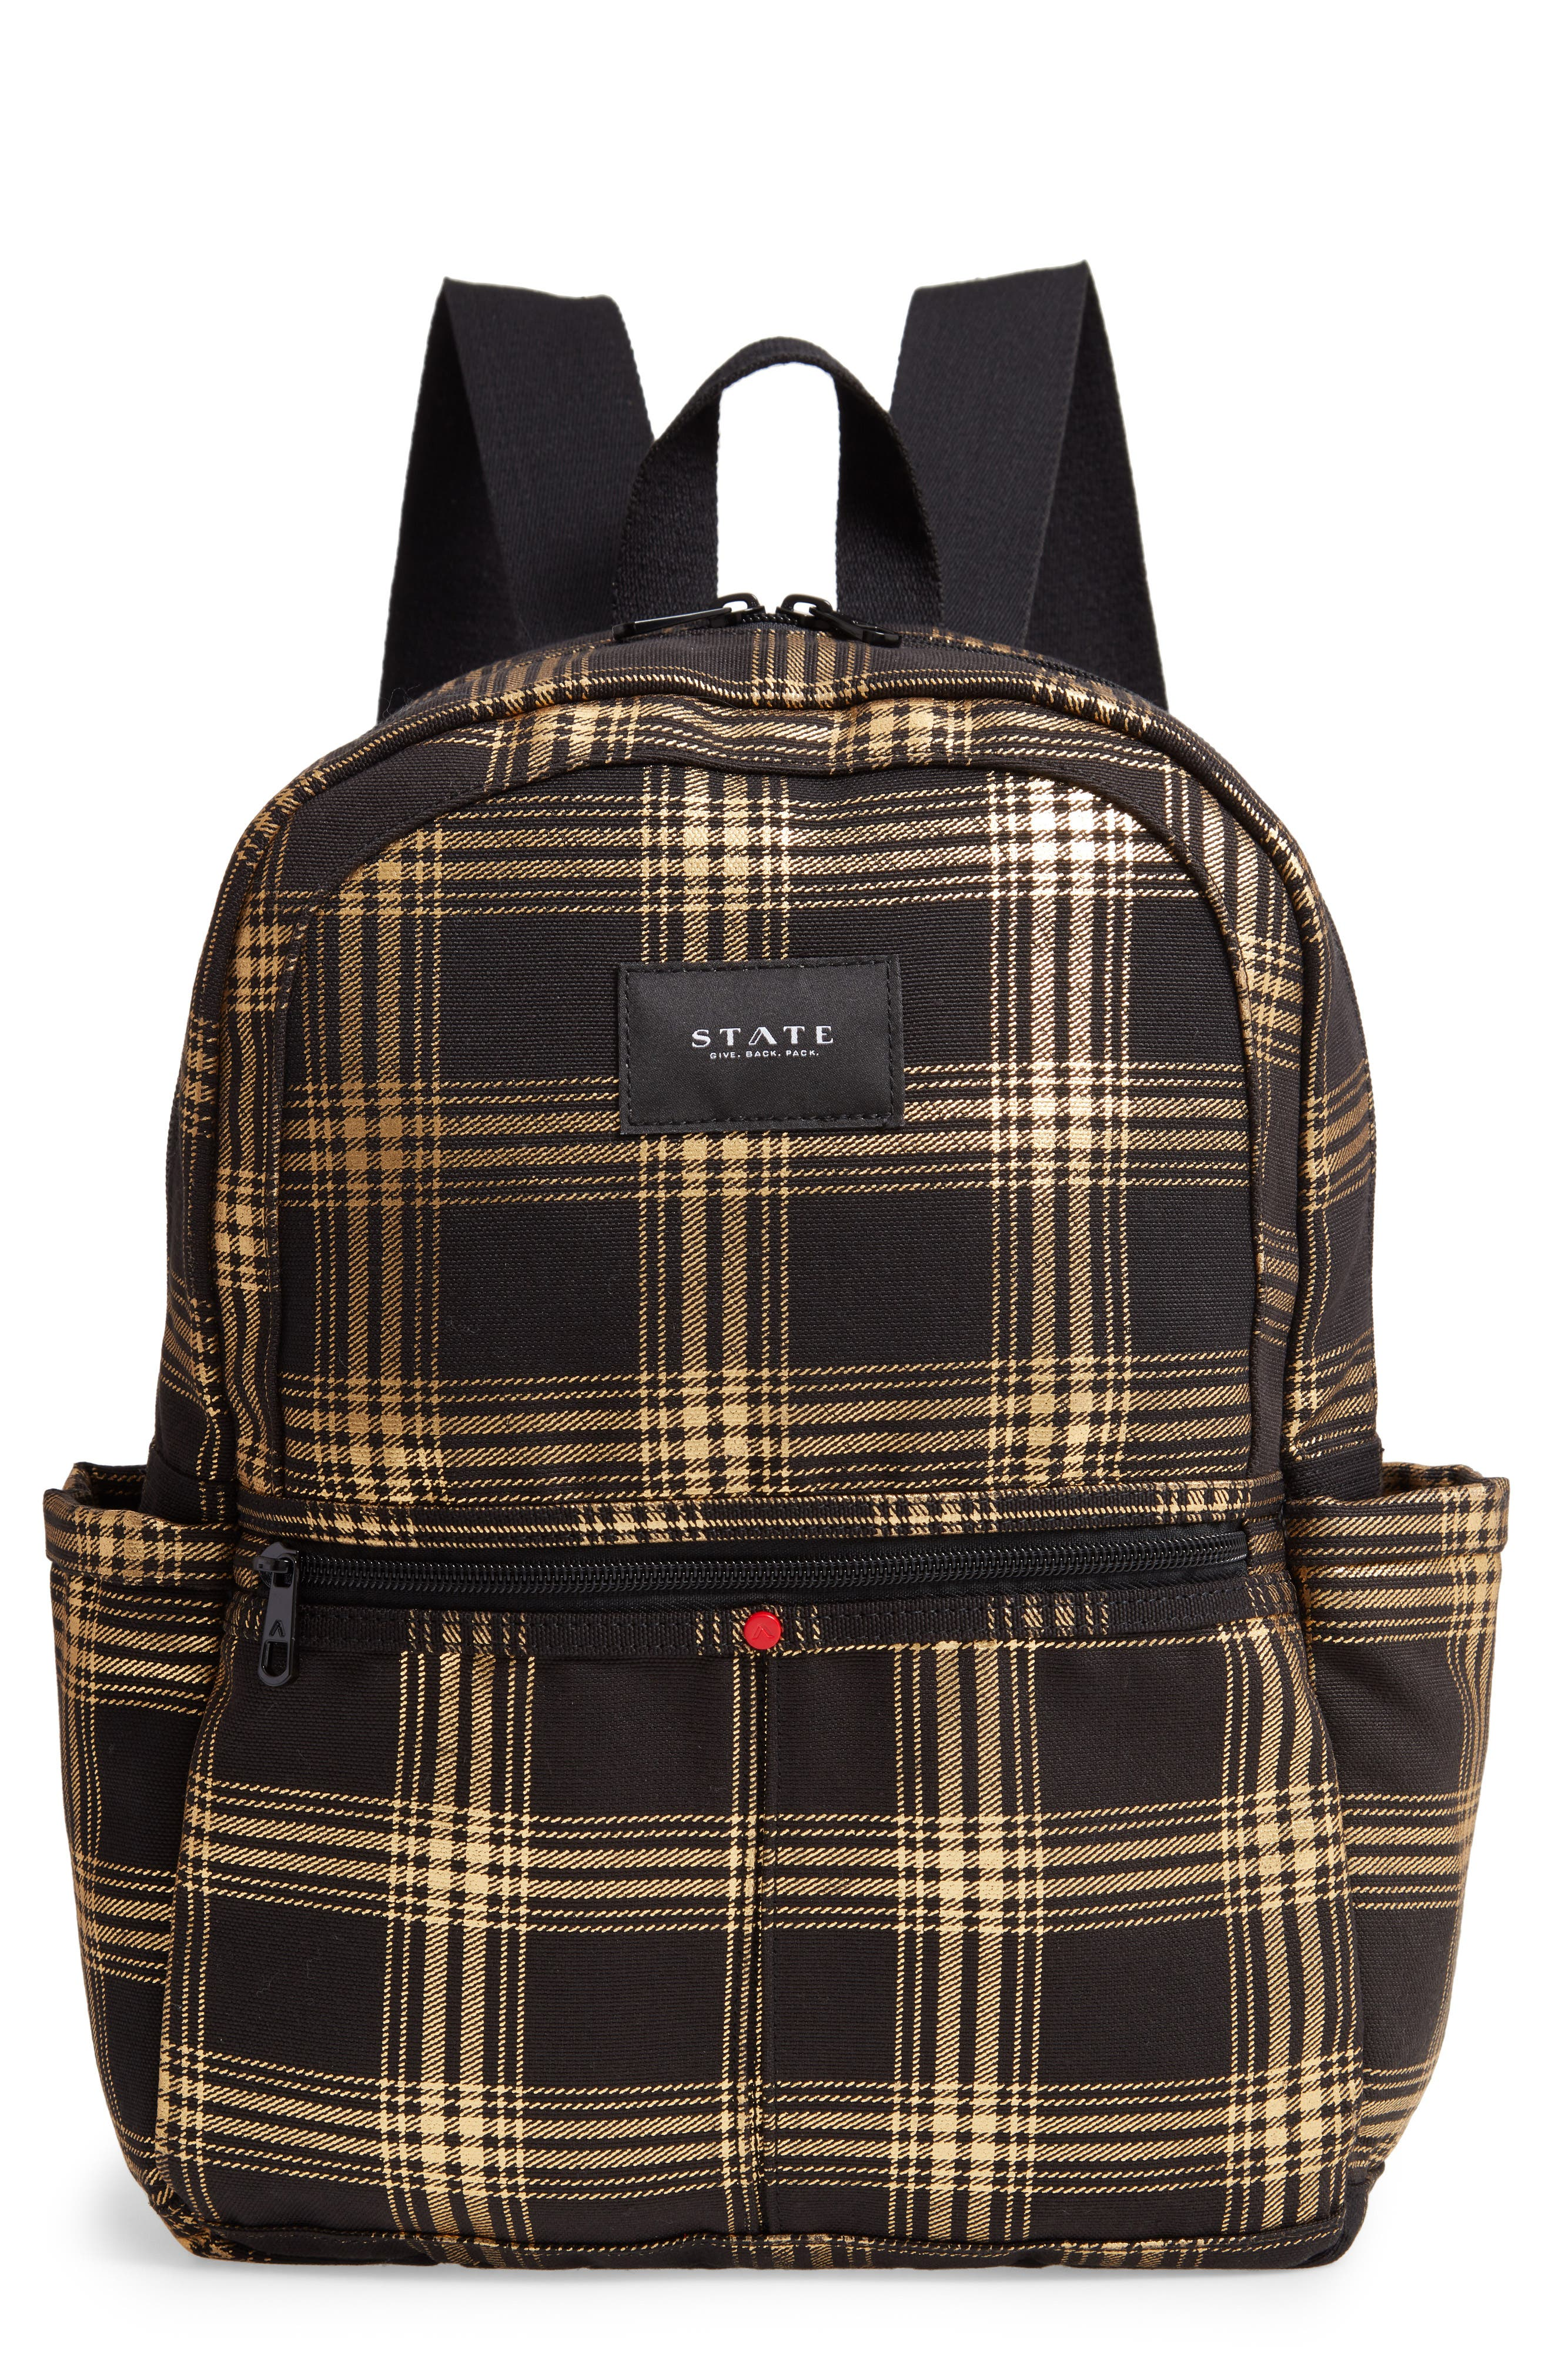 State Bags Kane Metallic Plaid Backpack -